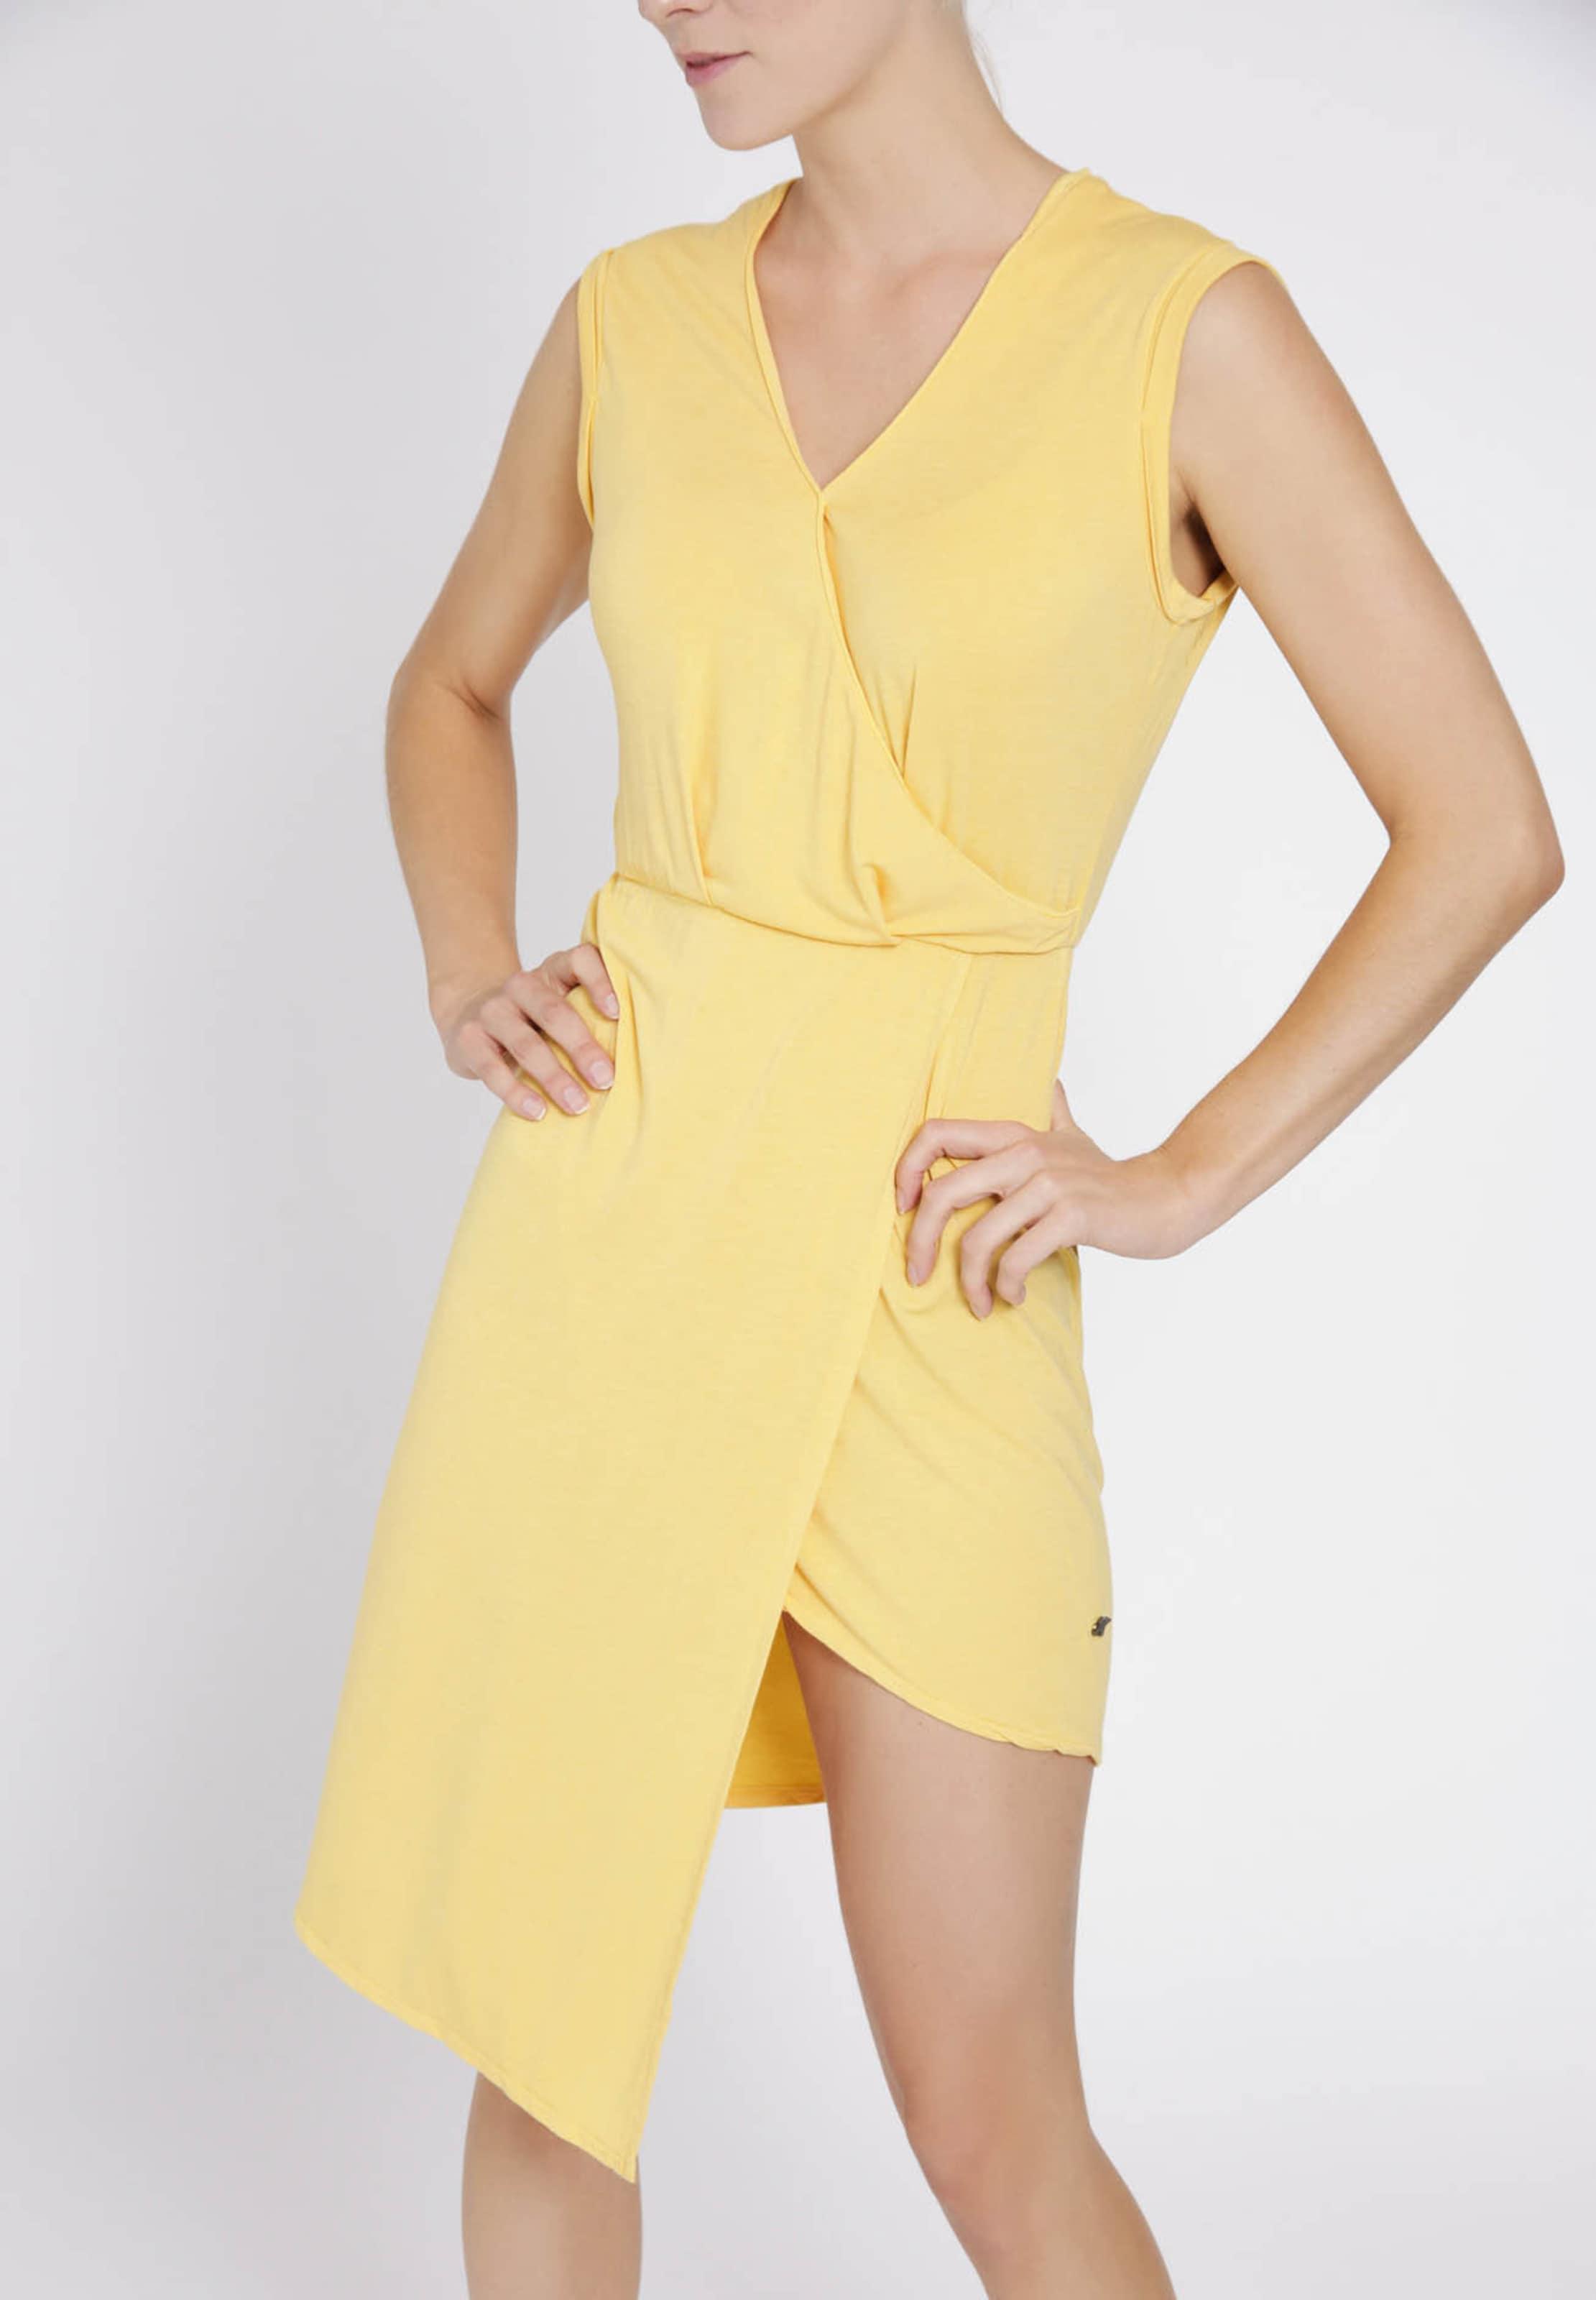 In Kleid 'aurelia' Gelb Kleid Khujo Khujo 0nwONvym8